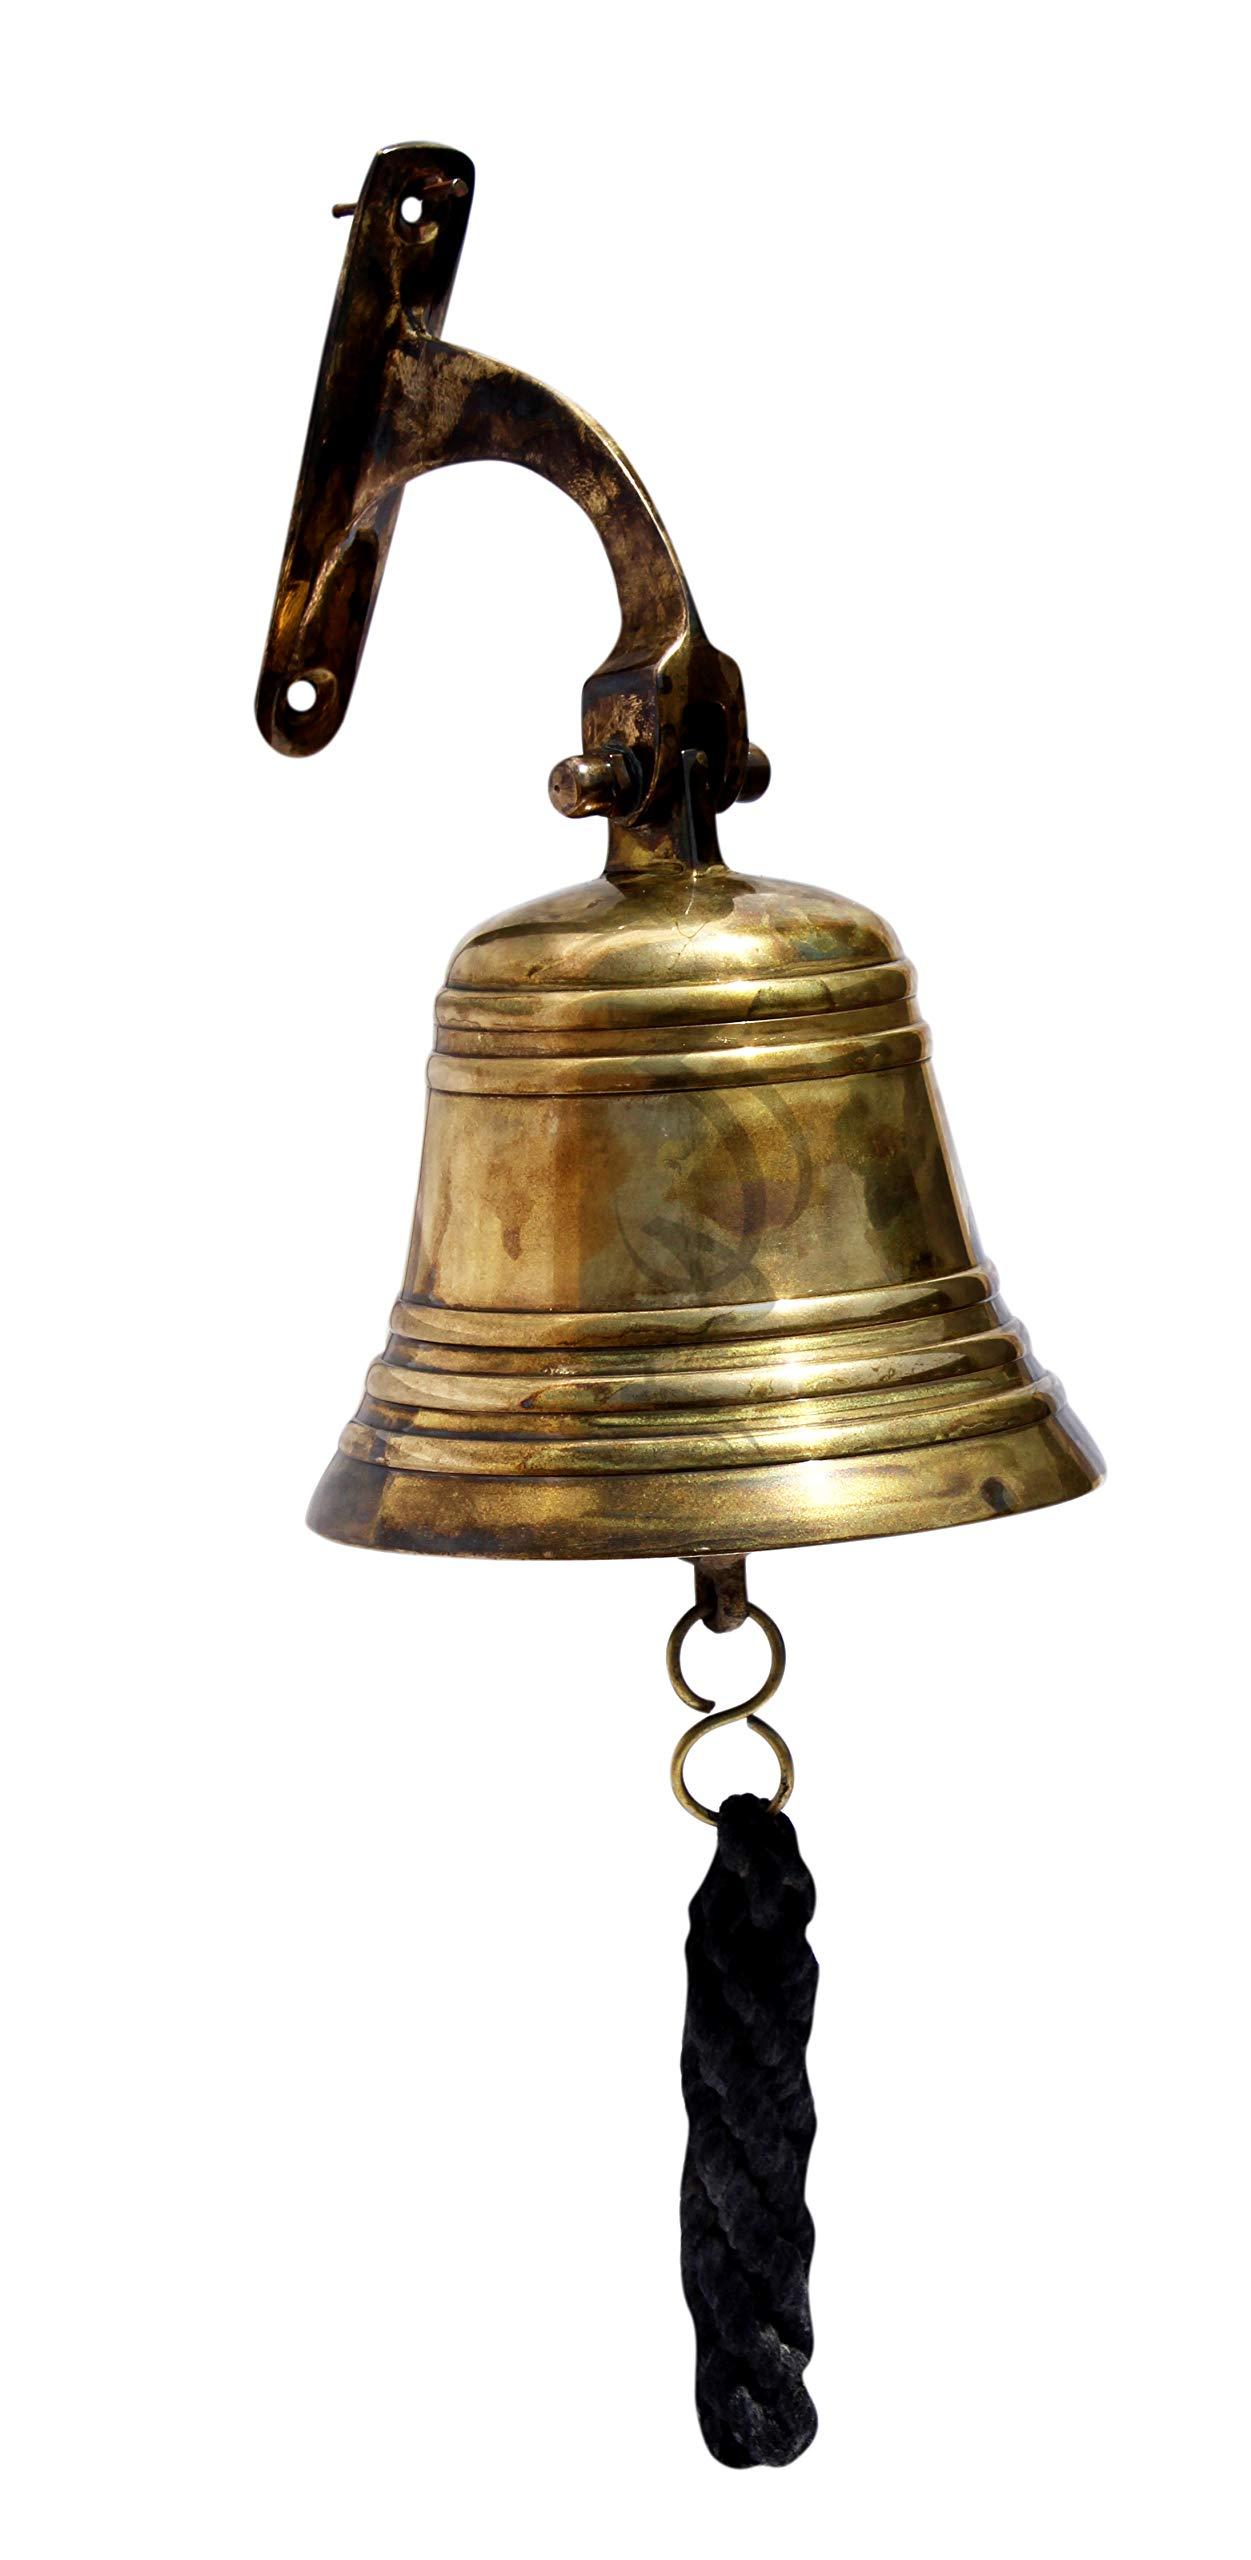 MAH Solid Brass Maritime Duty Ship Bell Nautical Home Decor Maritime Wall Bell C-3085